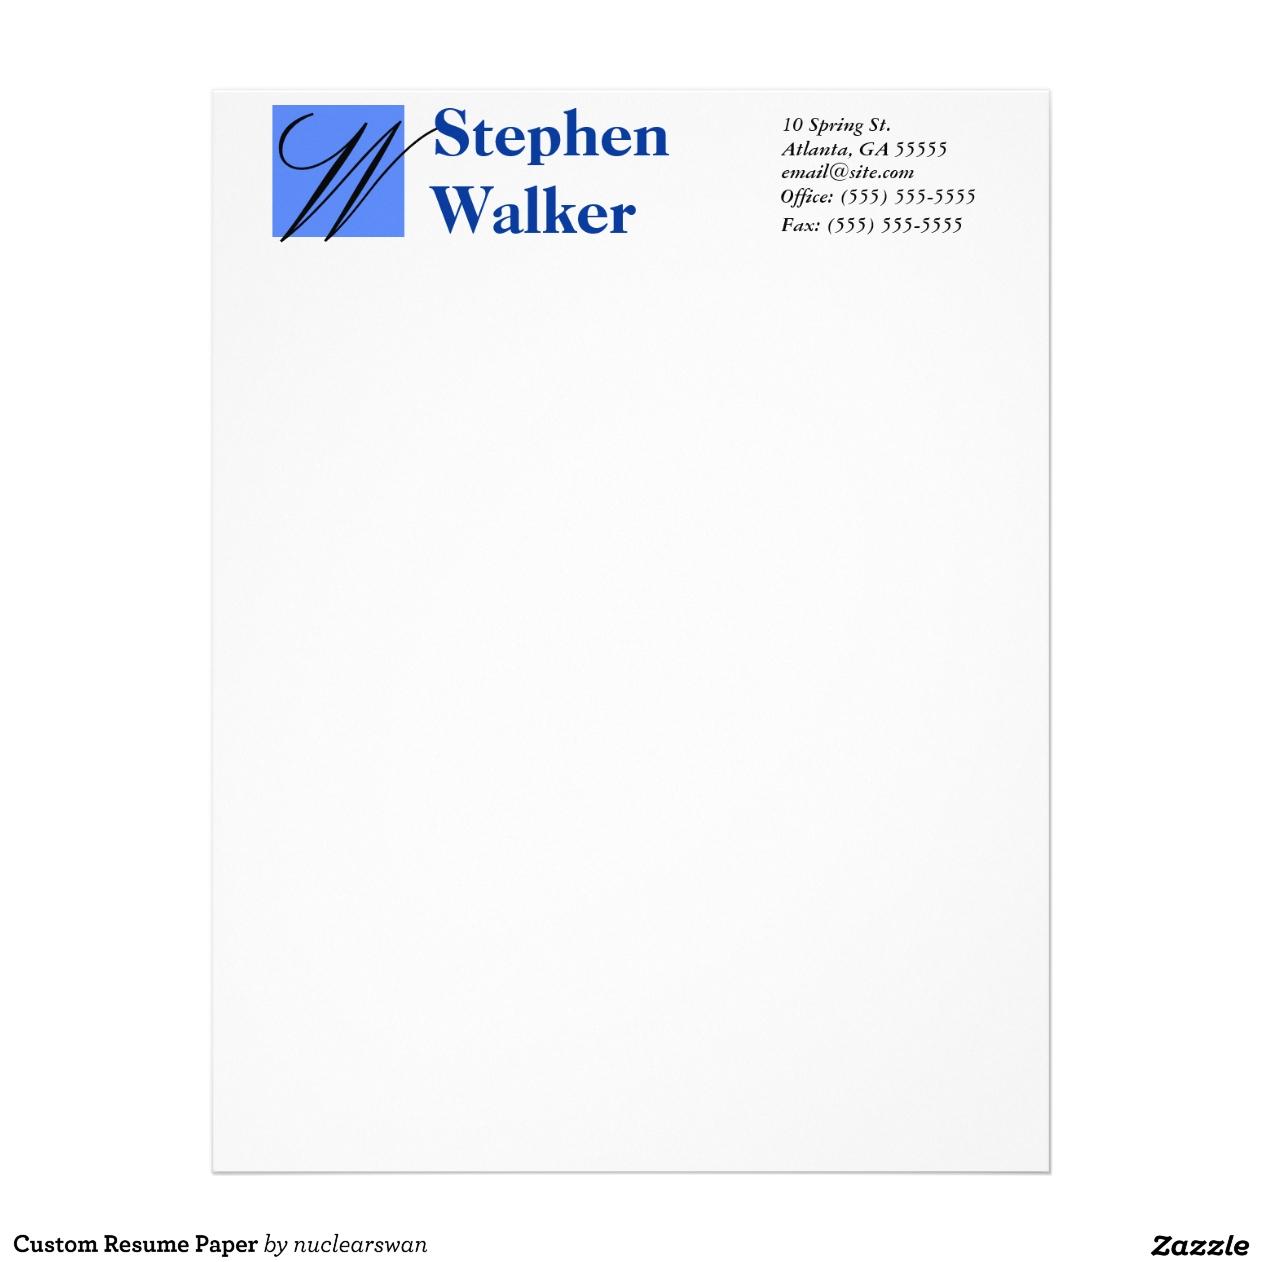 resume paper resume paper 0758